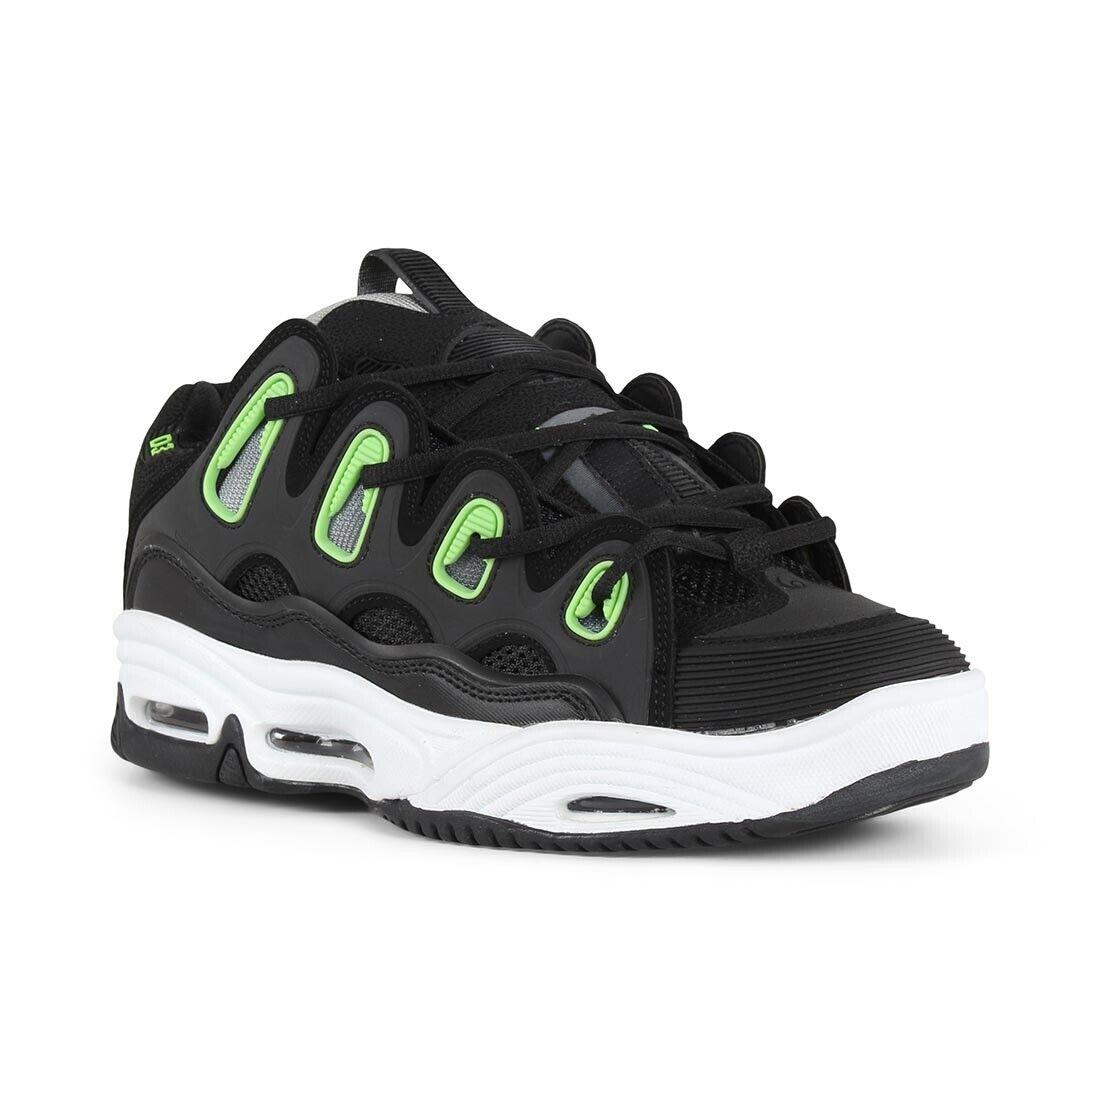 Osiris D3 2001 shoes - Black   White   Green